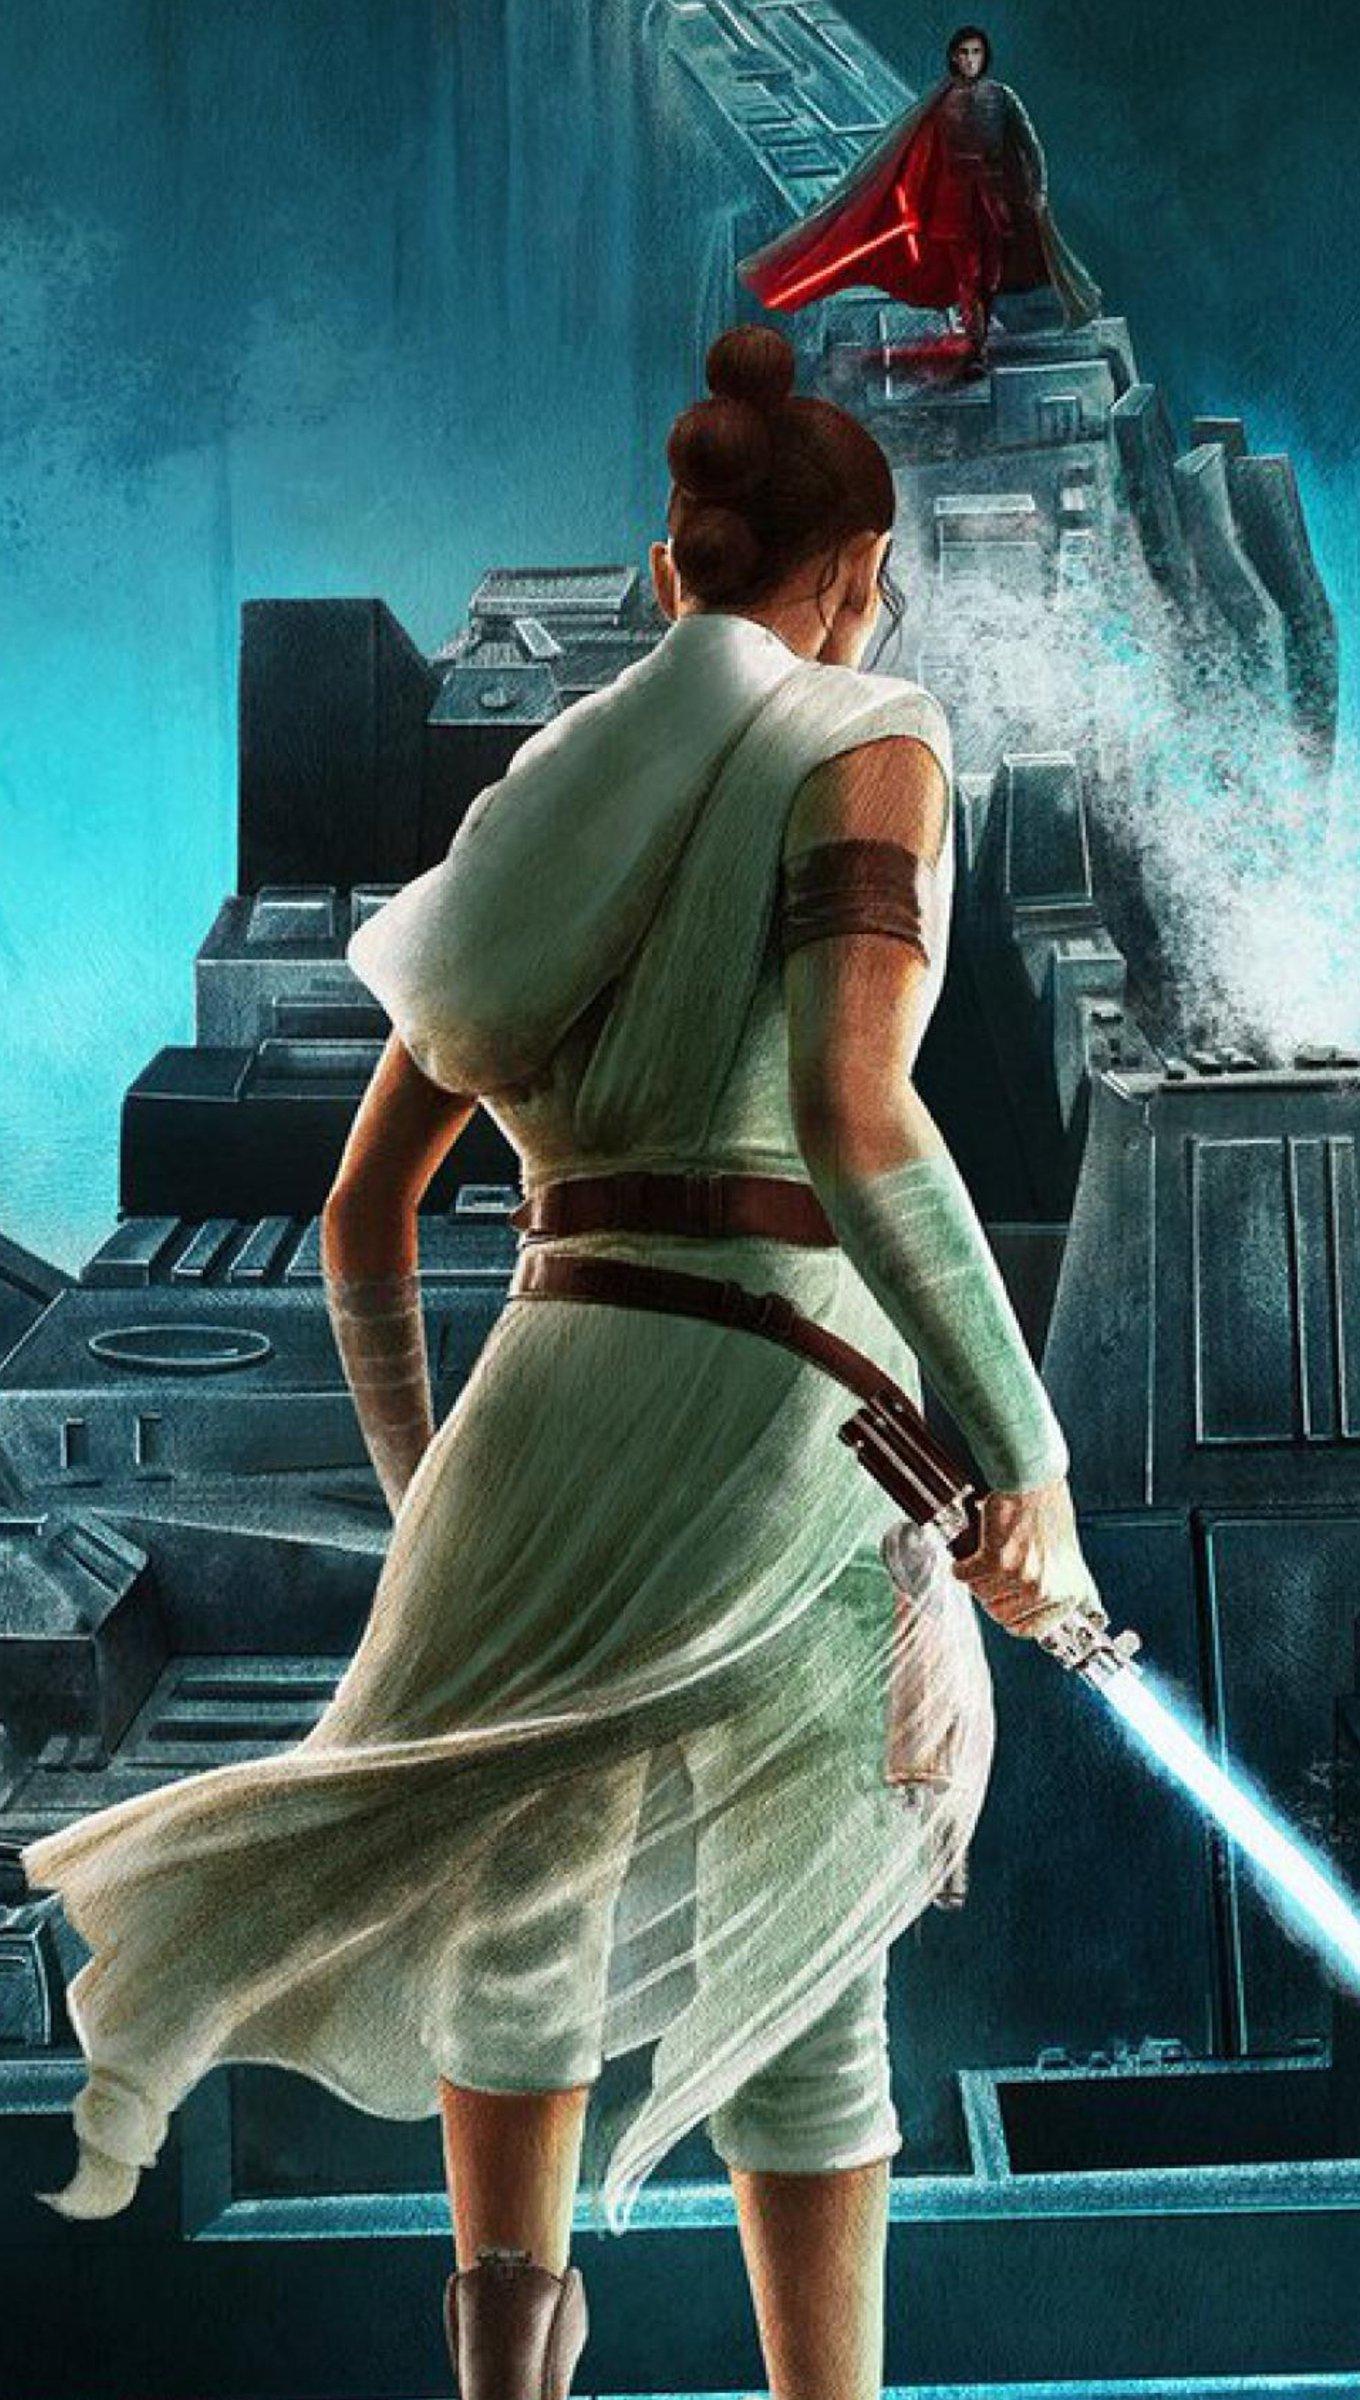 Fondos de pantalla Fanart de Rey de Star wars Vertical